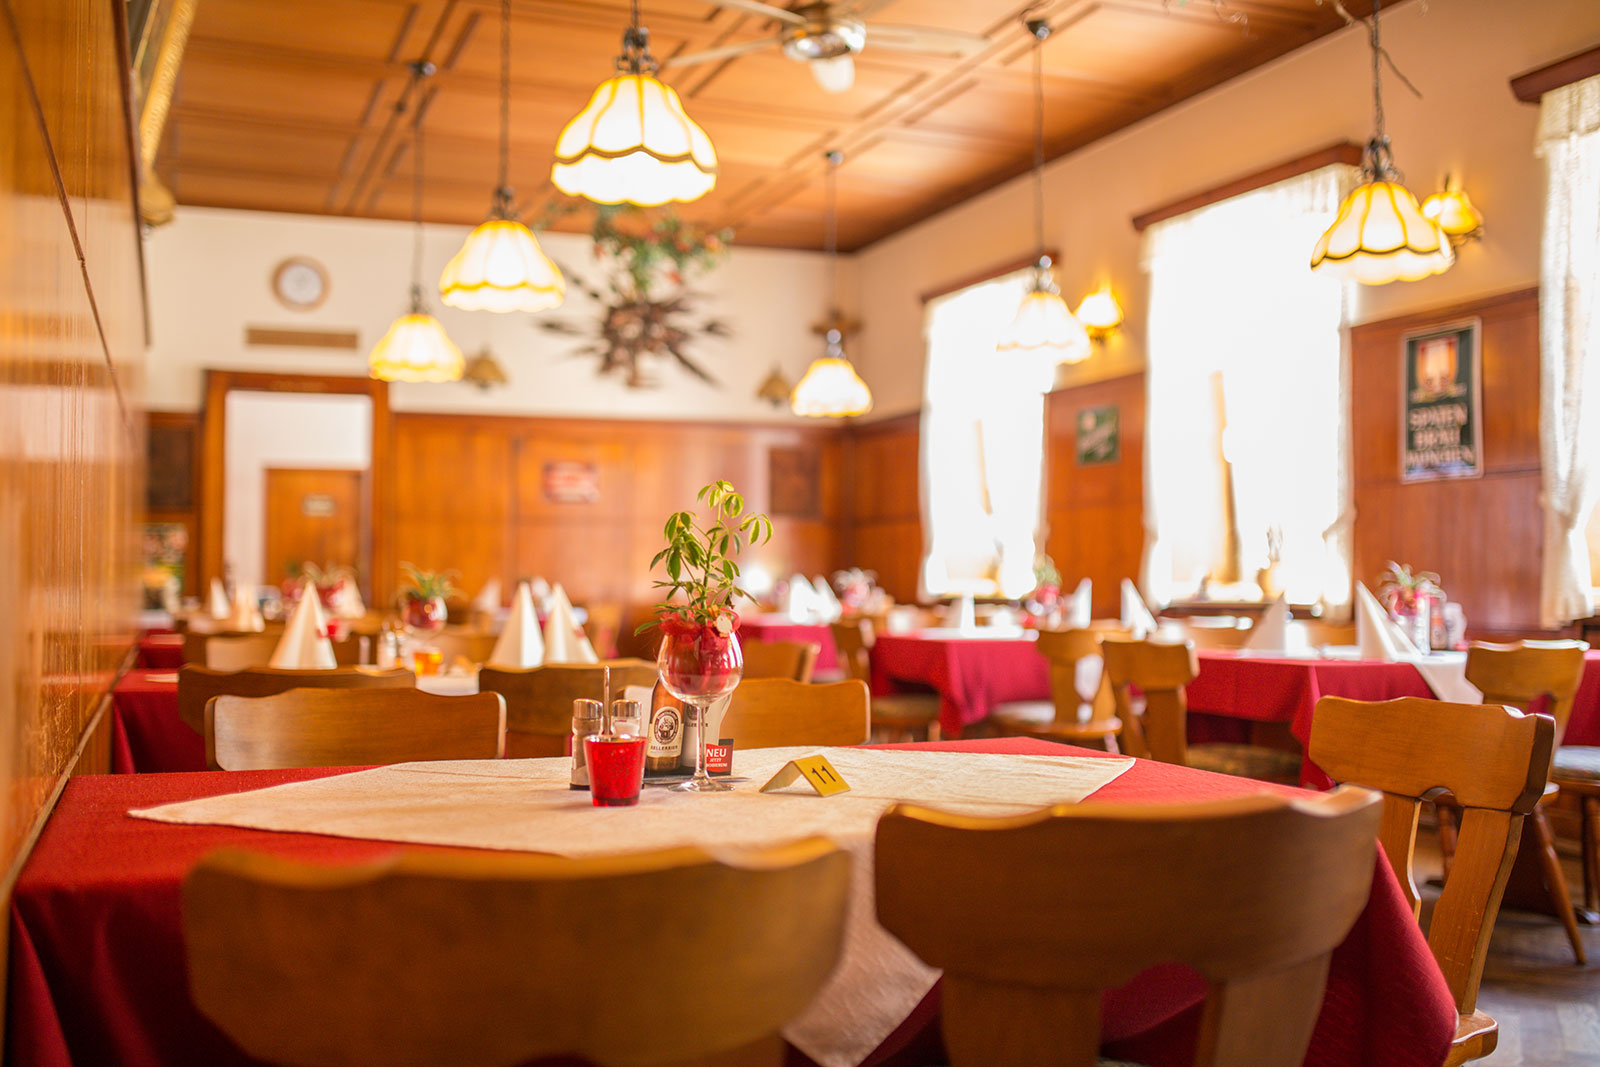 https://www.hotelwiendl.de/wp-content/uploads/2016/02/Restaurant.jpg